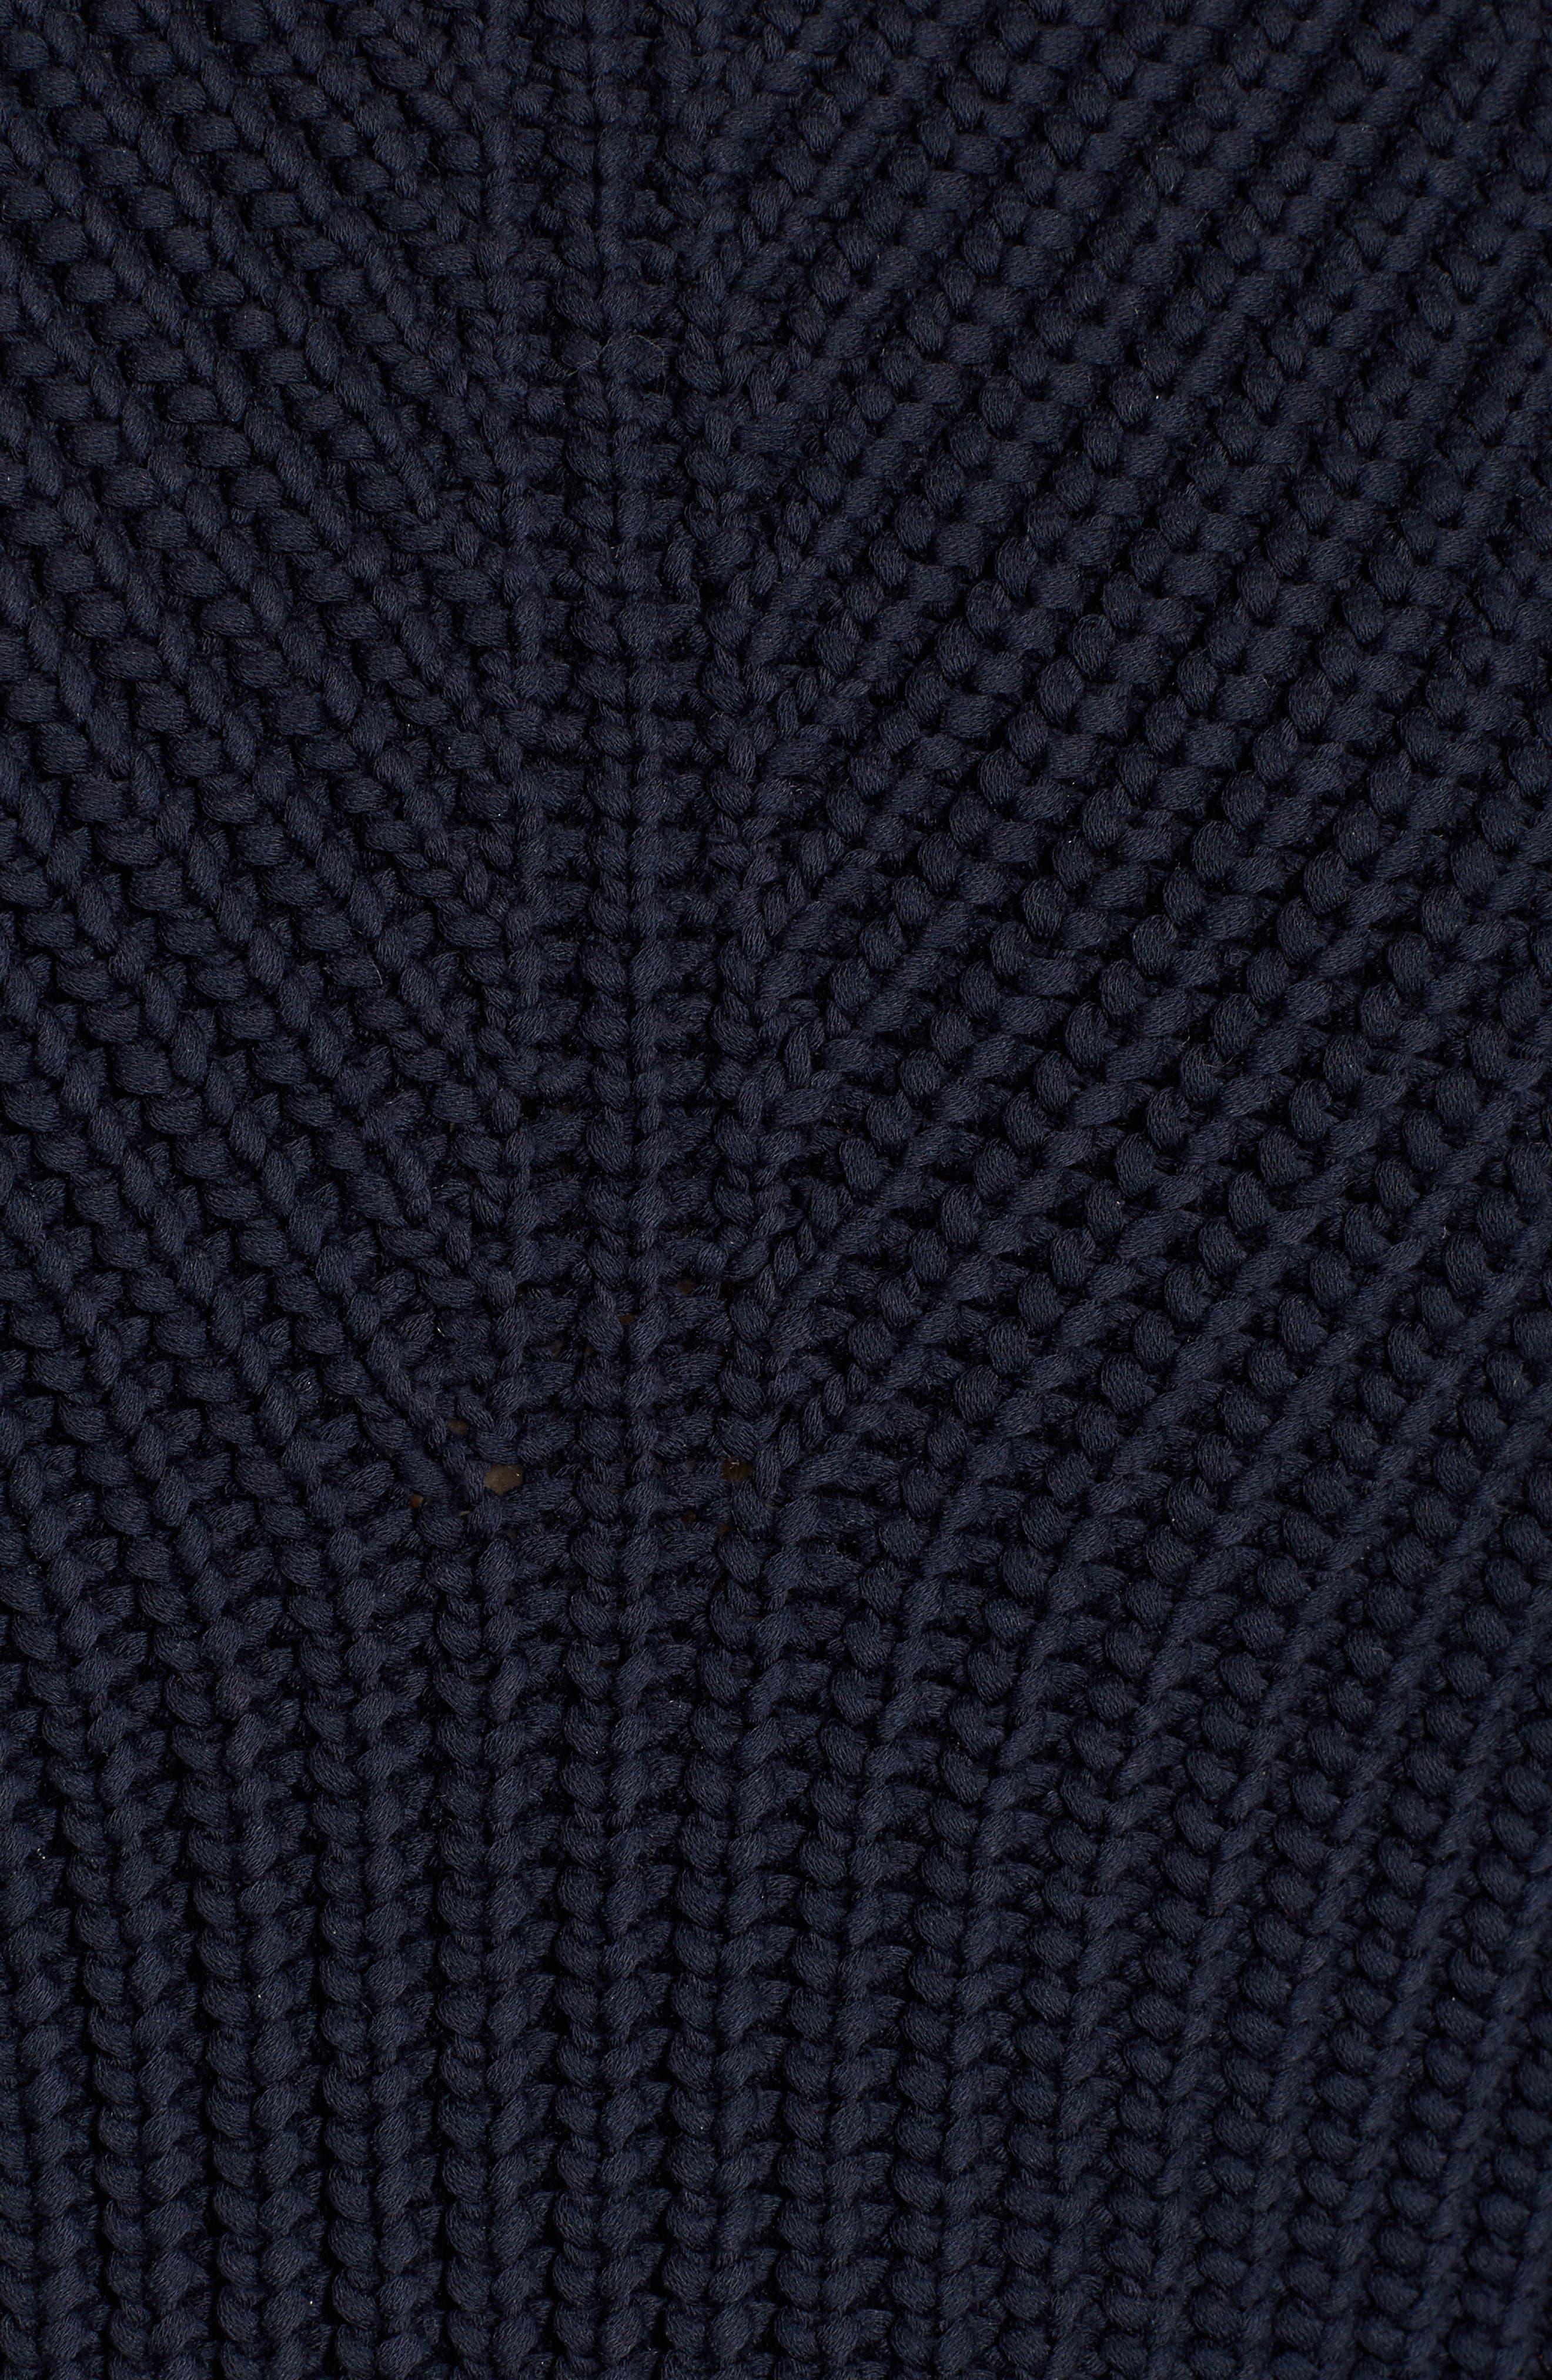 Raglan Sleeve Knit Sweater,                             Alternate thumbnail 5, color,                             410